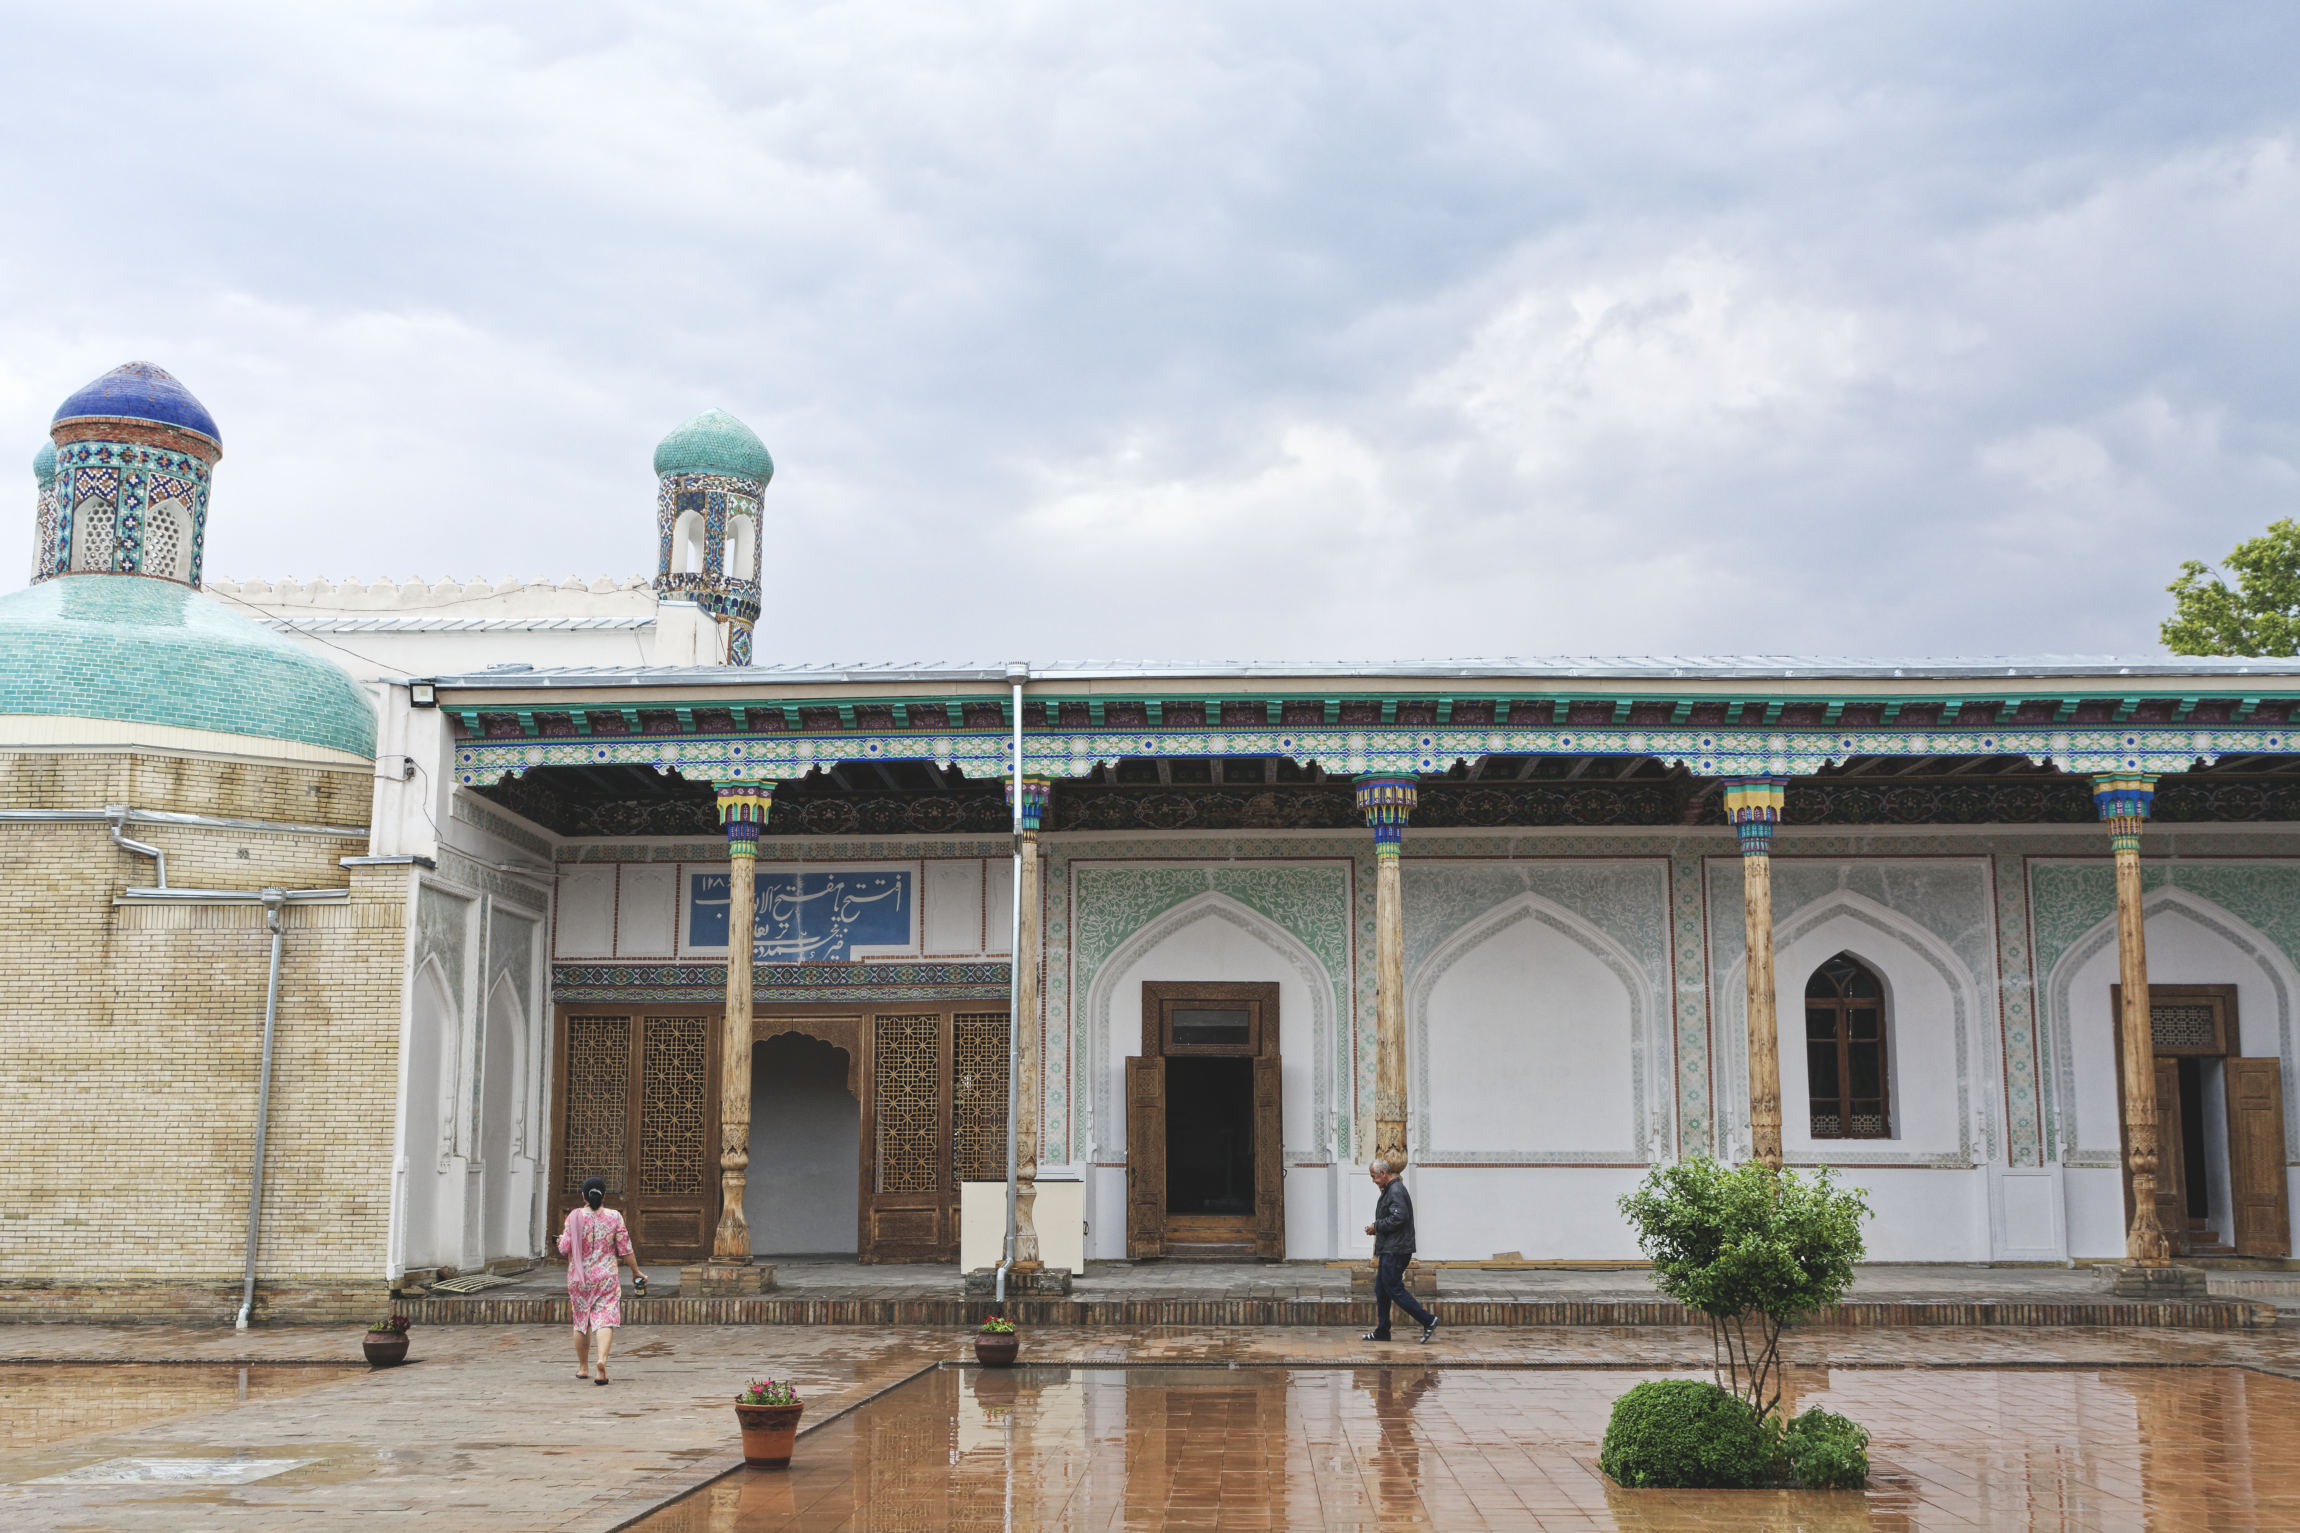 Ouzbékistan Ferghana Kokand